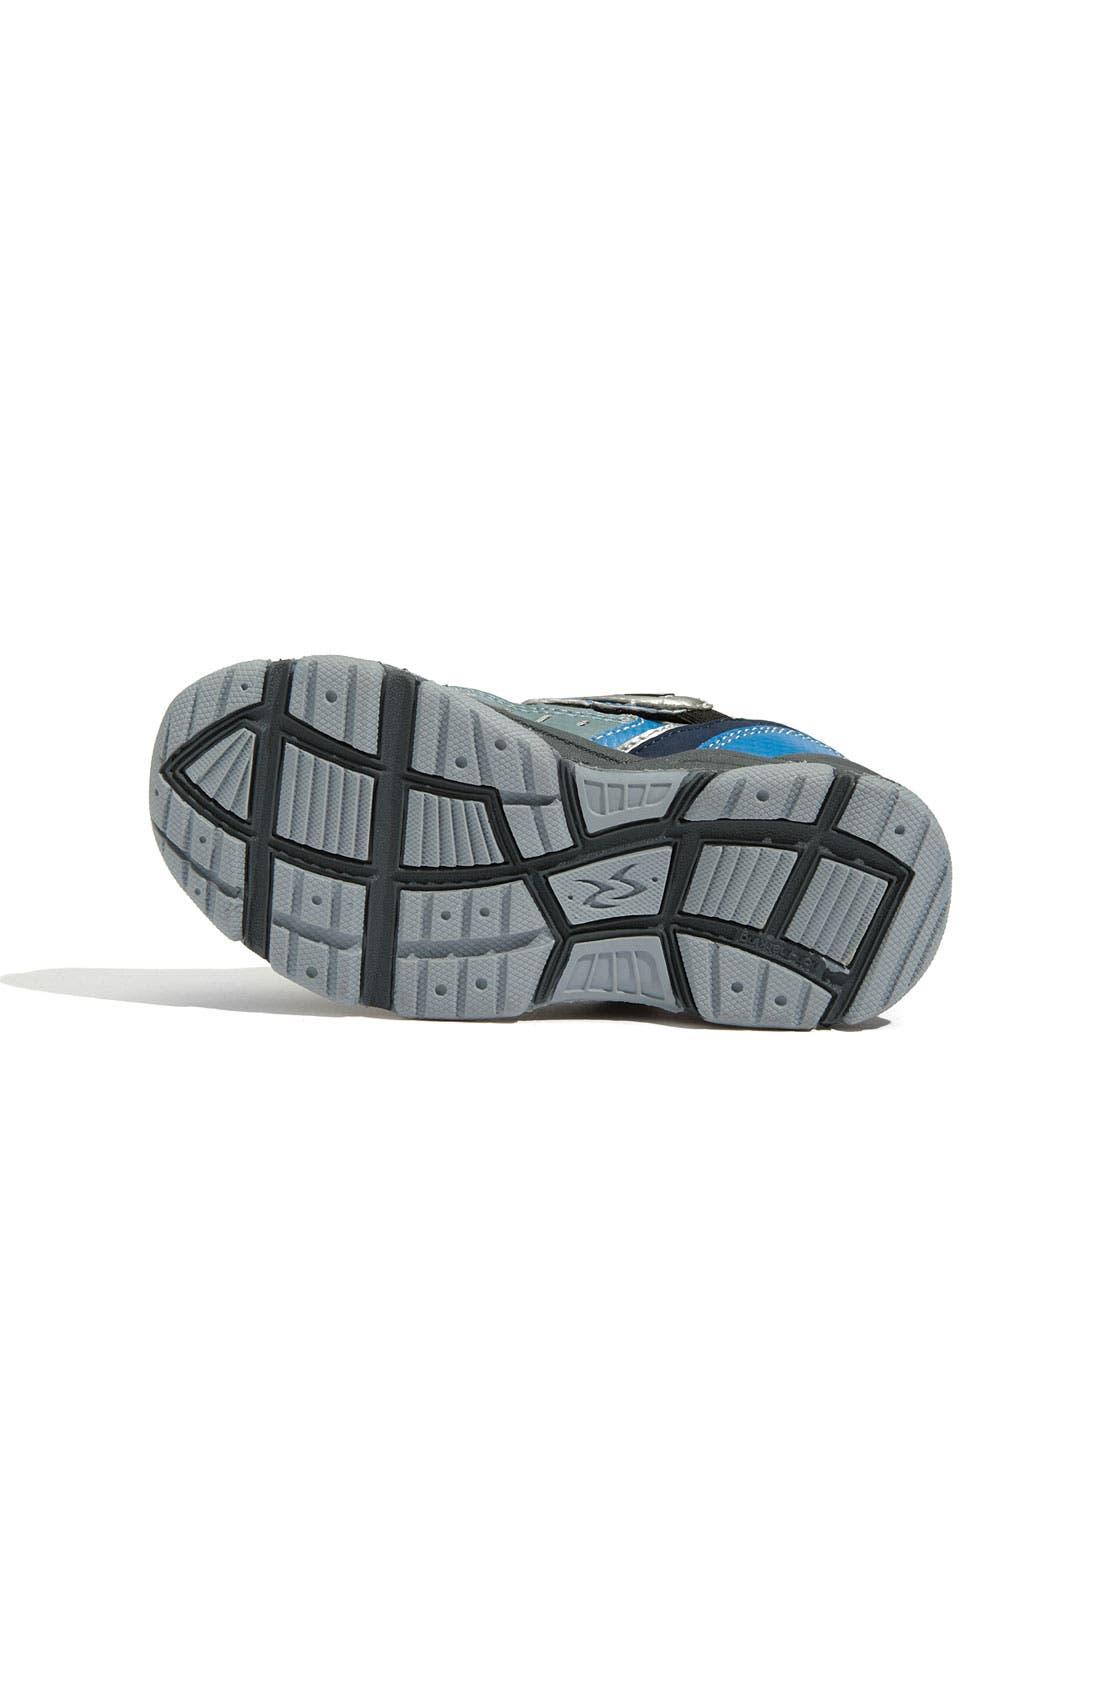 'Star Wars<sup>™</sup> - Pre Vizsla' Lighted Sneaker,                             Alternate thumbnail 4, color,                             089